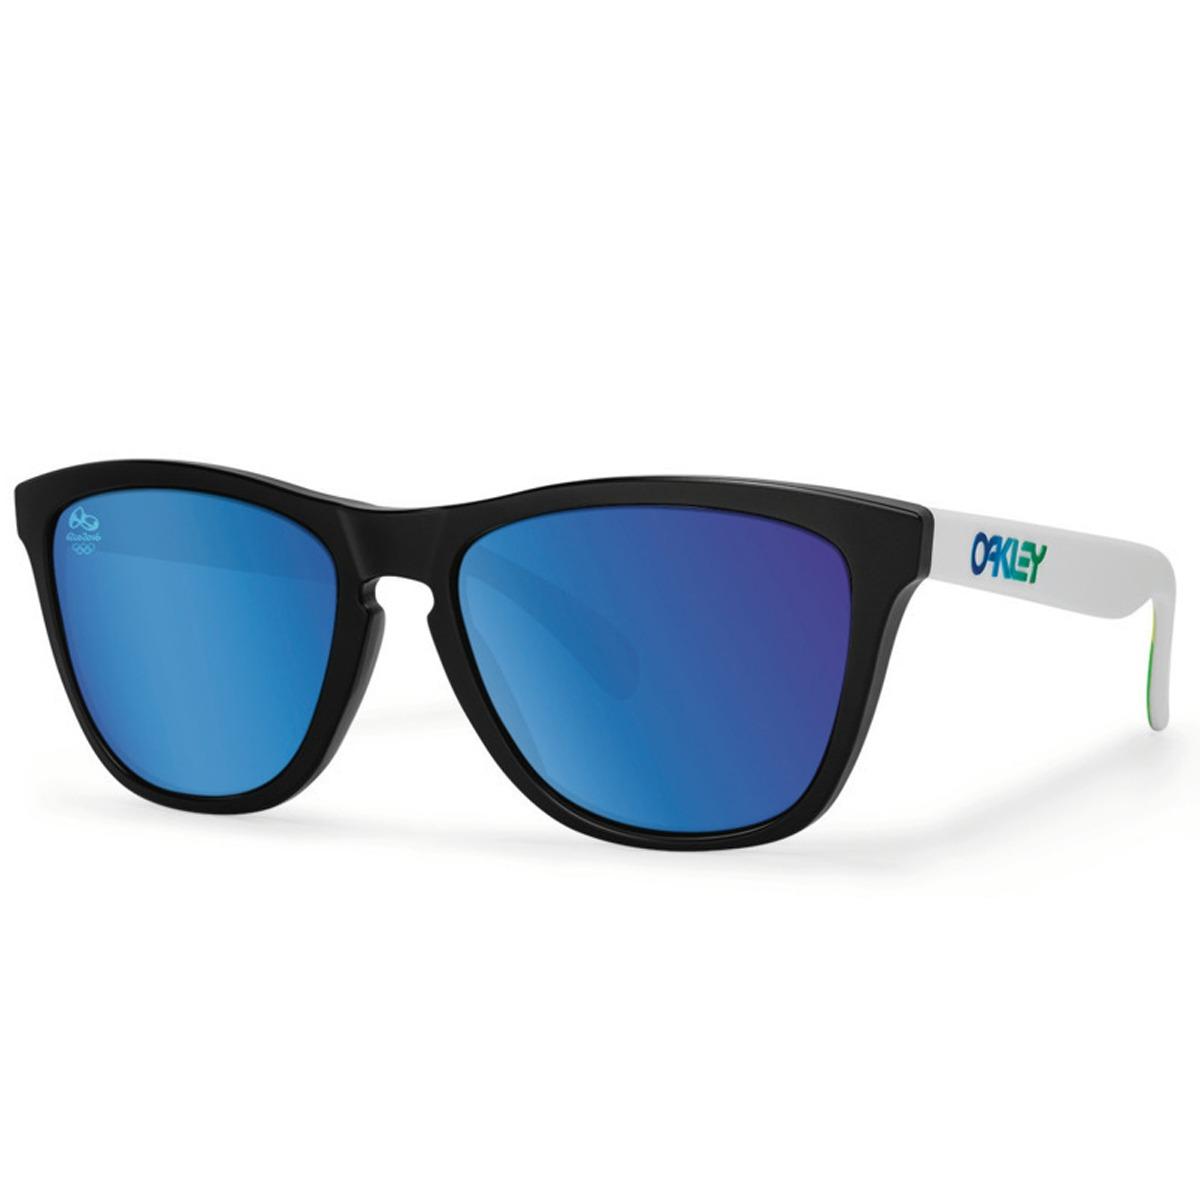 Óculos Oakley Frogskins - R  479,90 em Mercado Livre d6d57ed856